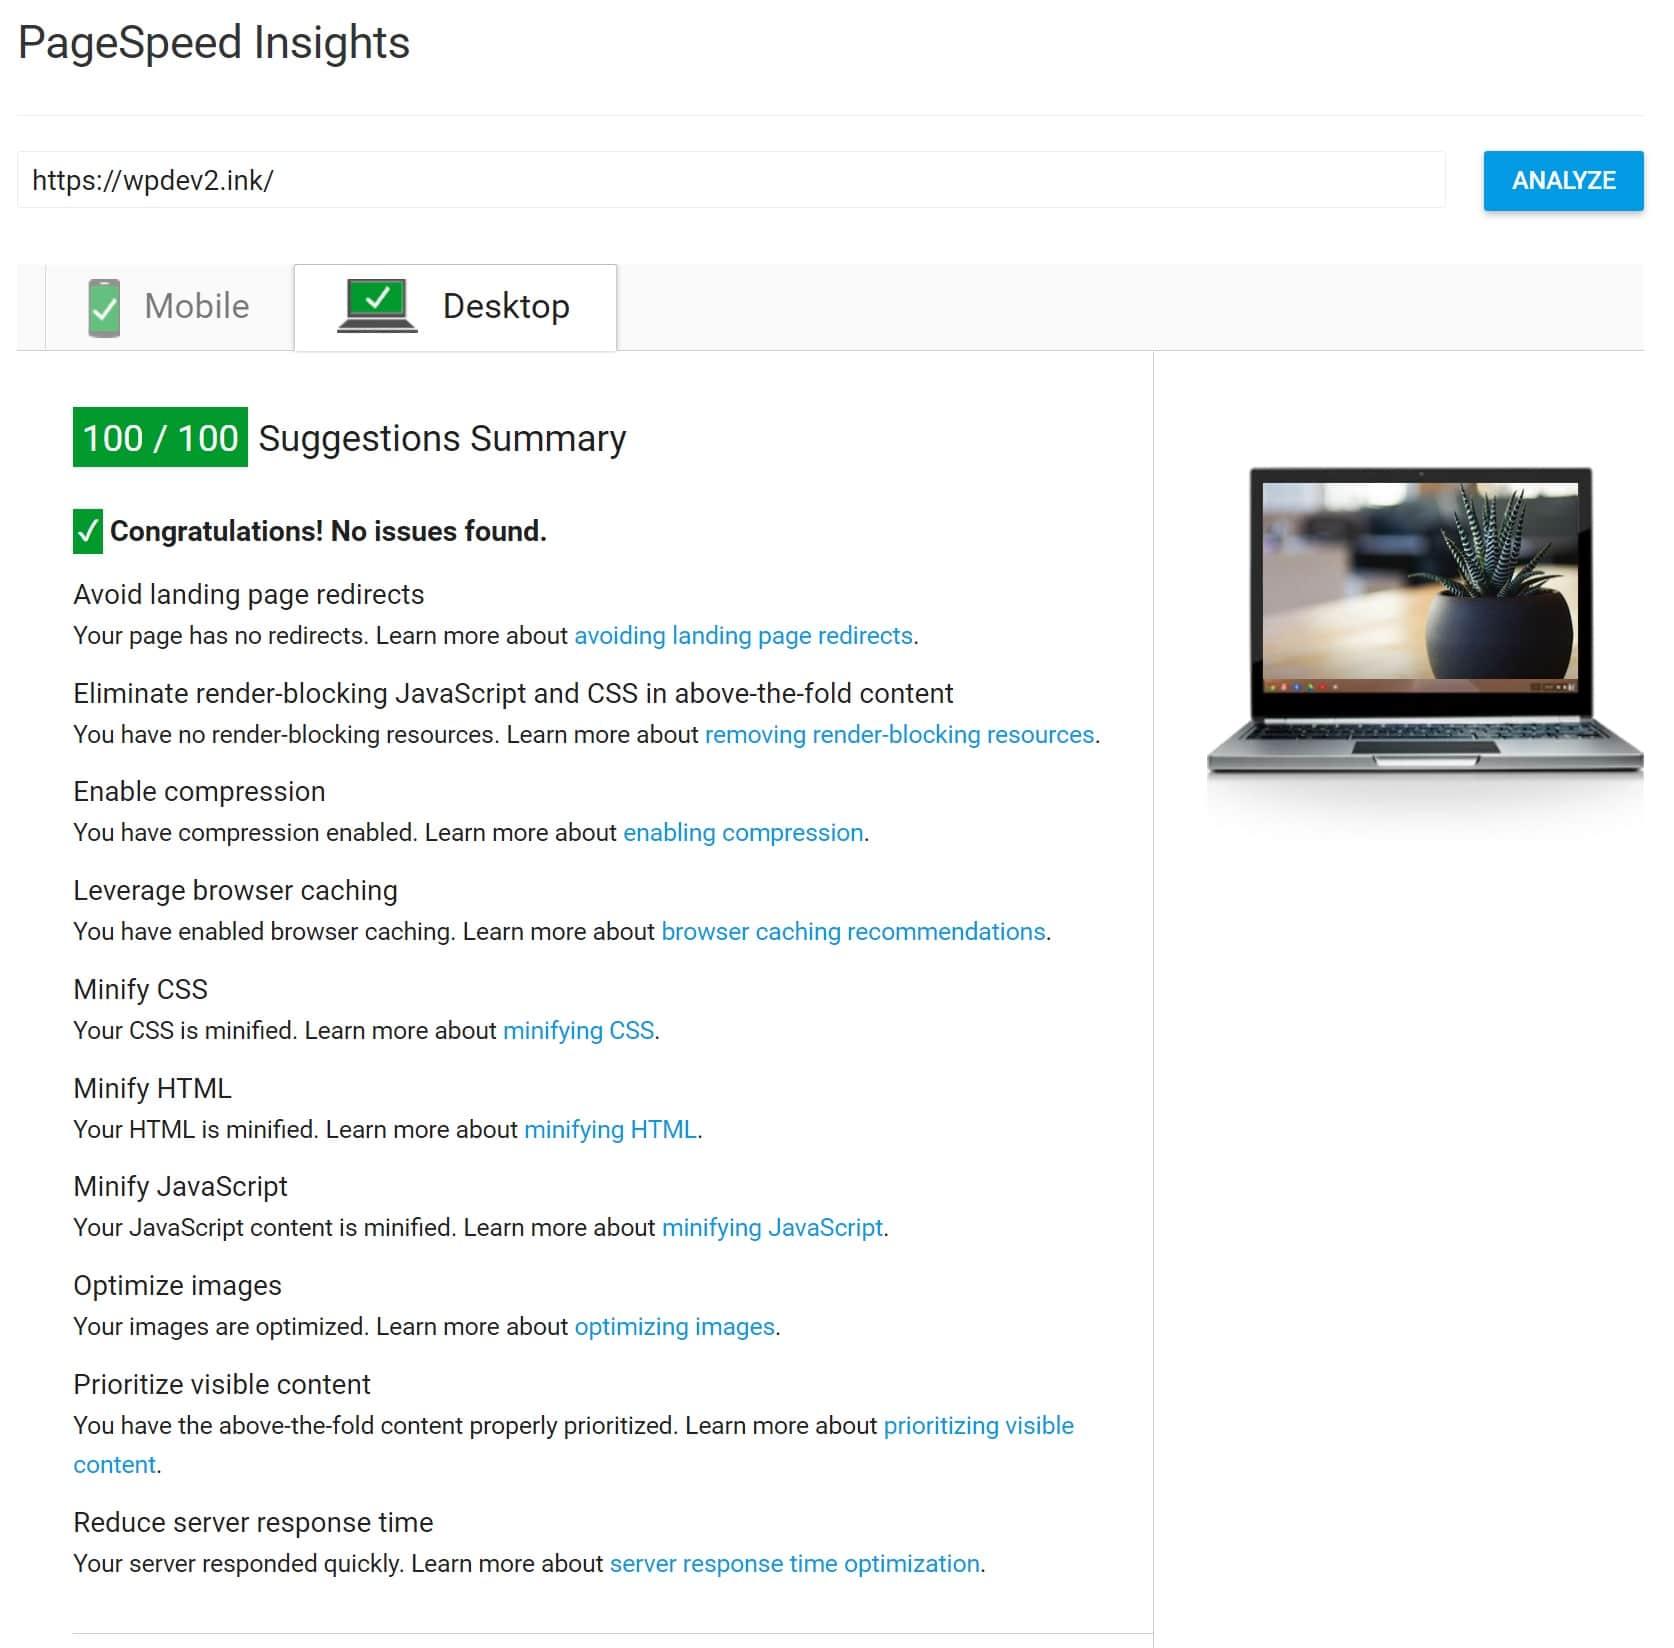 100/100 Google PageSpeed Insights Score